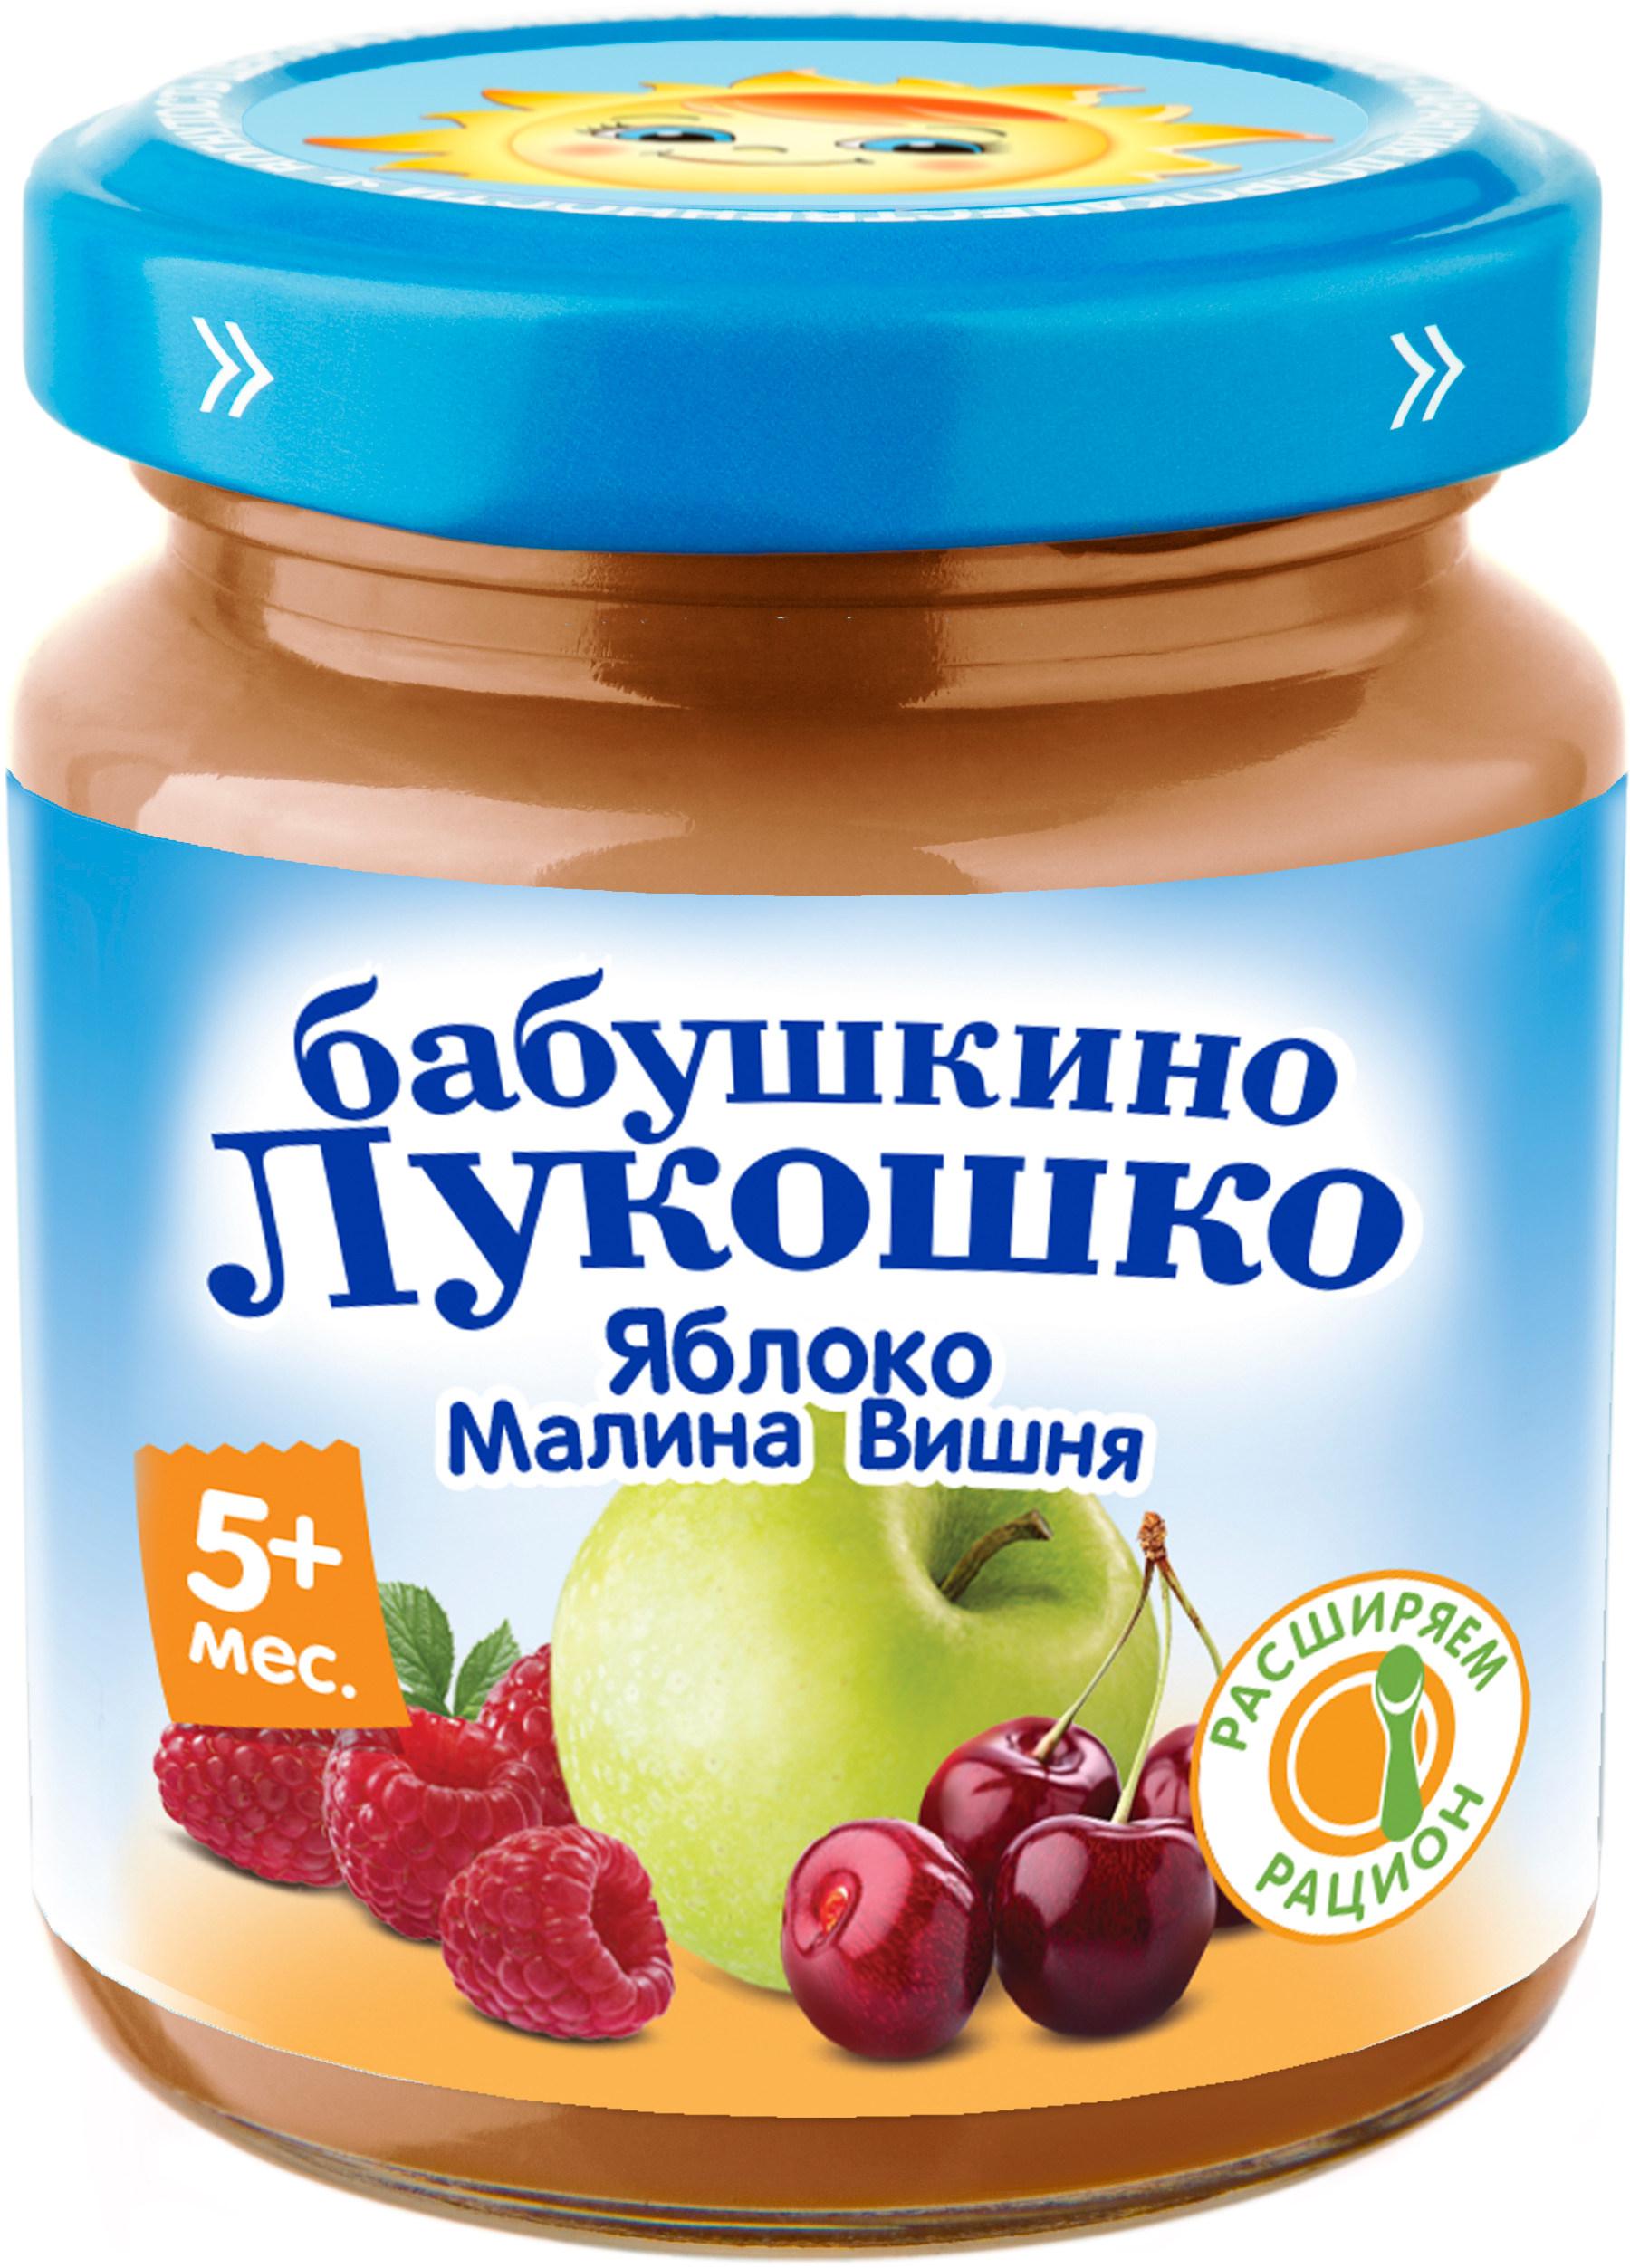 Пюре Бабушкино лукошко Бабушкино лукошко Яблоко, малина, вишня с 5 мес. 100 г пюре gerber яблоко и малина с 5 мес 125 г